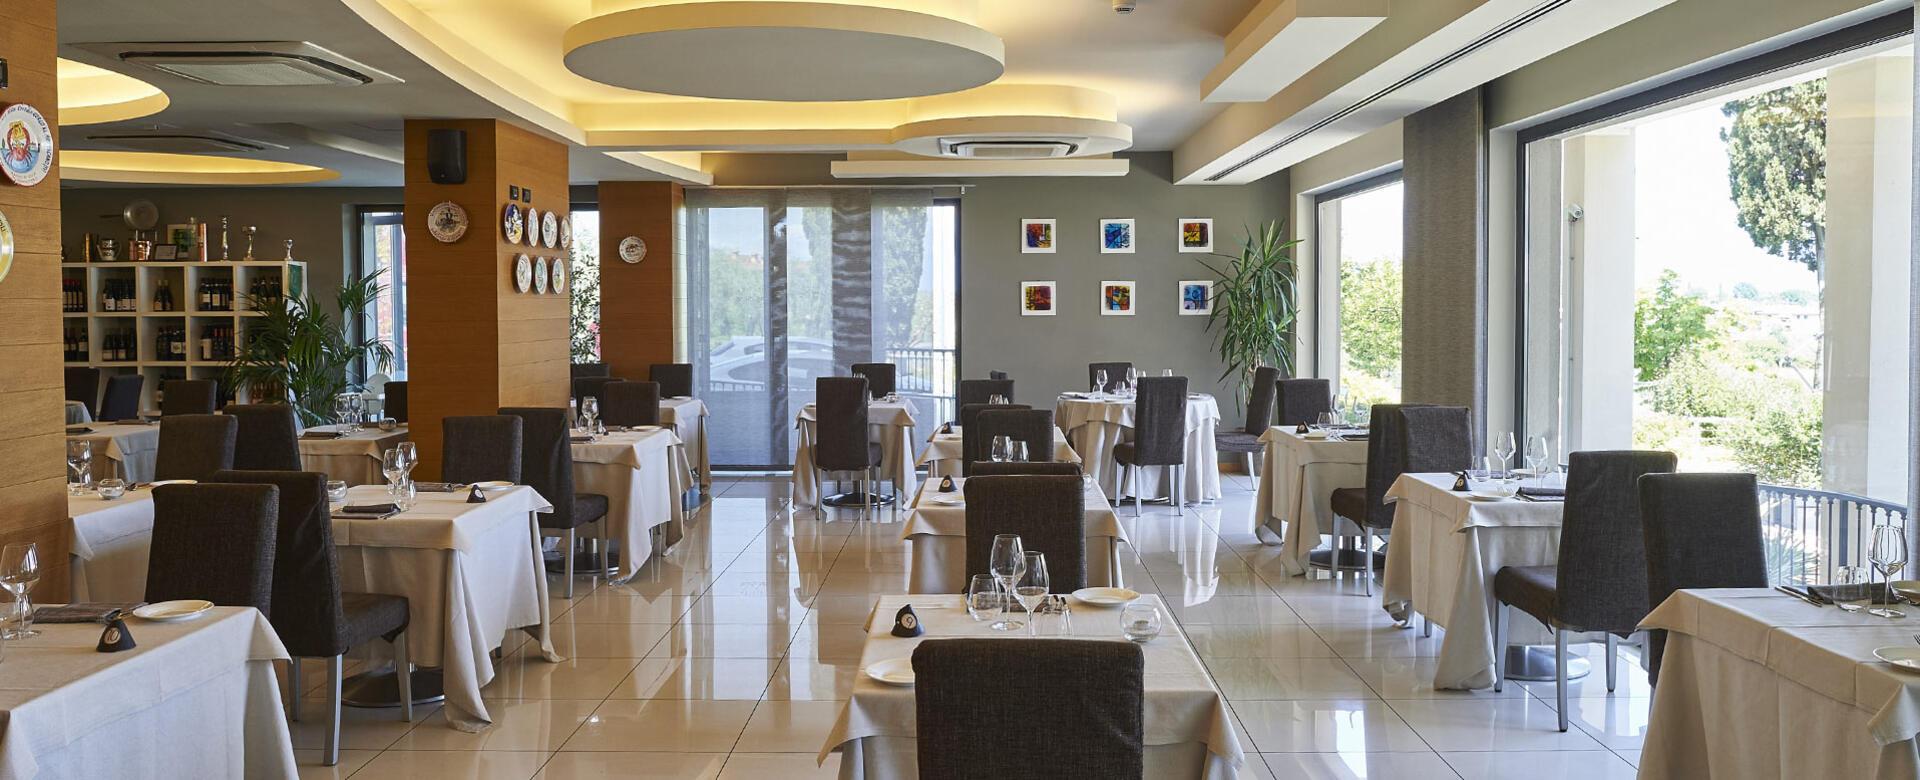 hotelvillaluisa en gastronomy 004